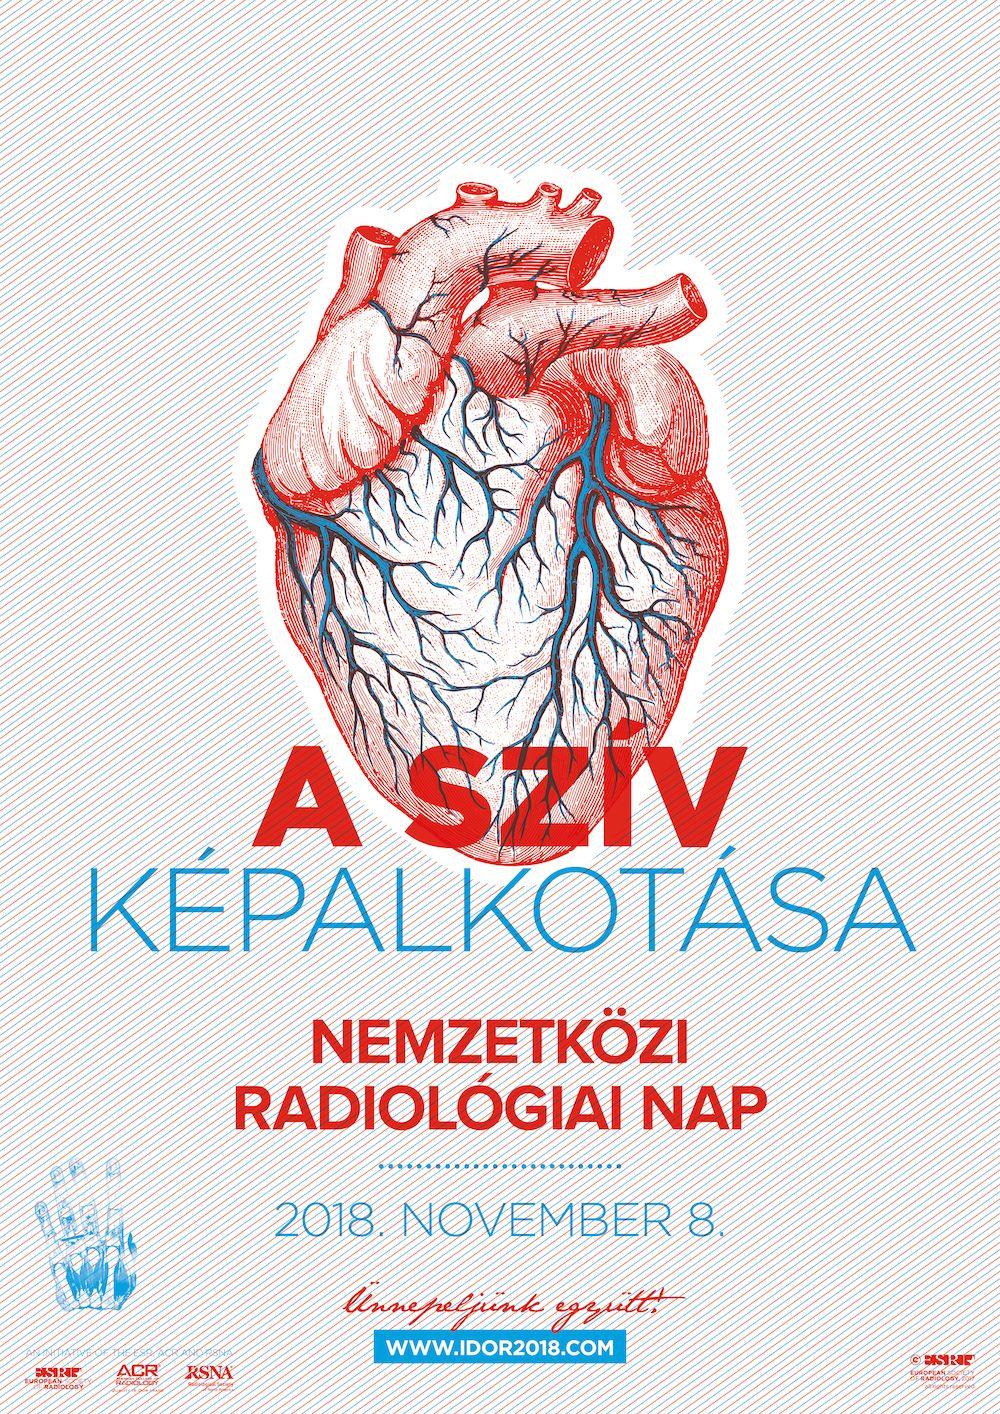 Nemzetközi radiológiai nap - International Day of Radiology 2018